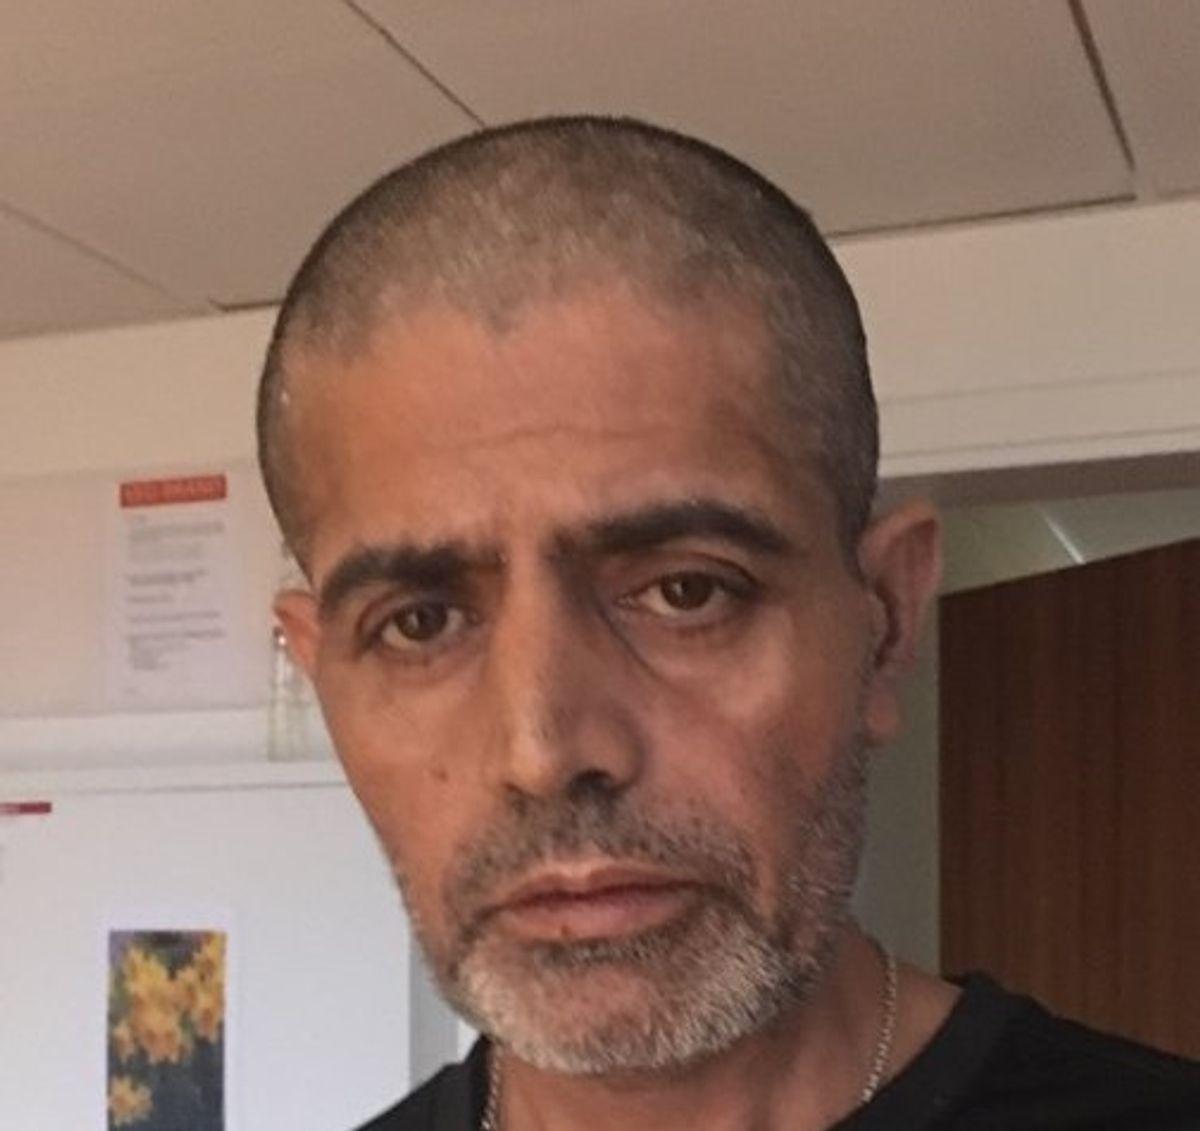 Politiet efterlyser denne mand